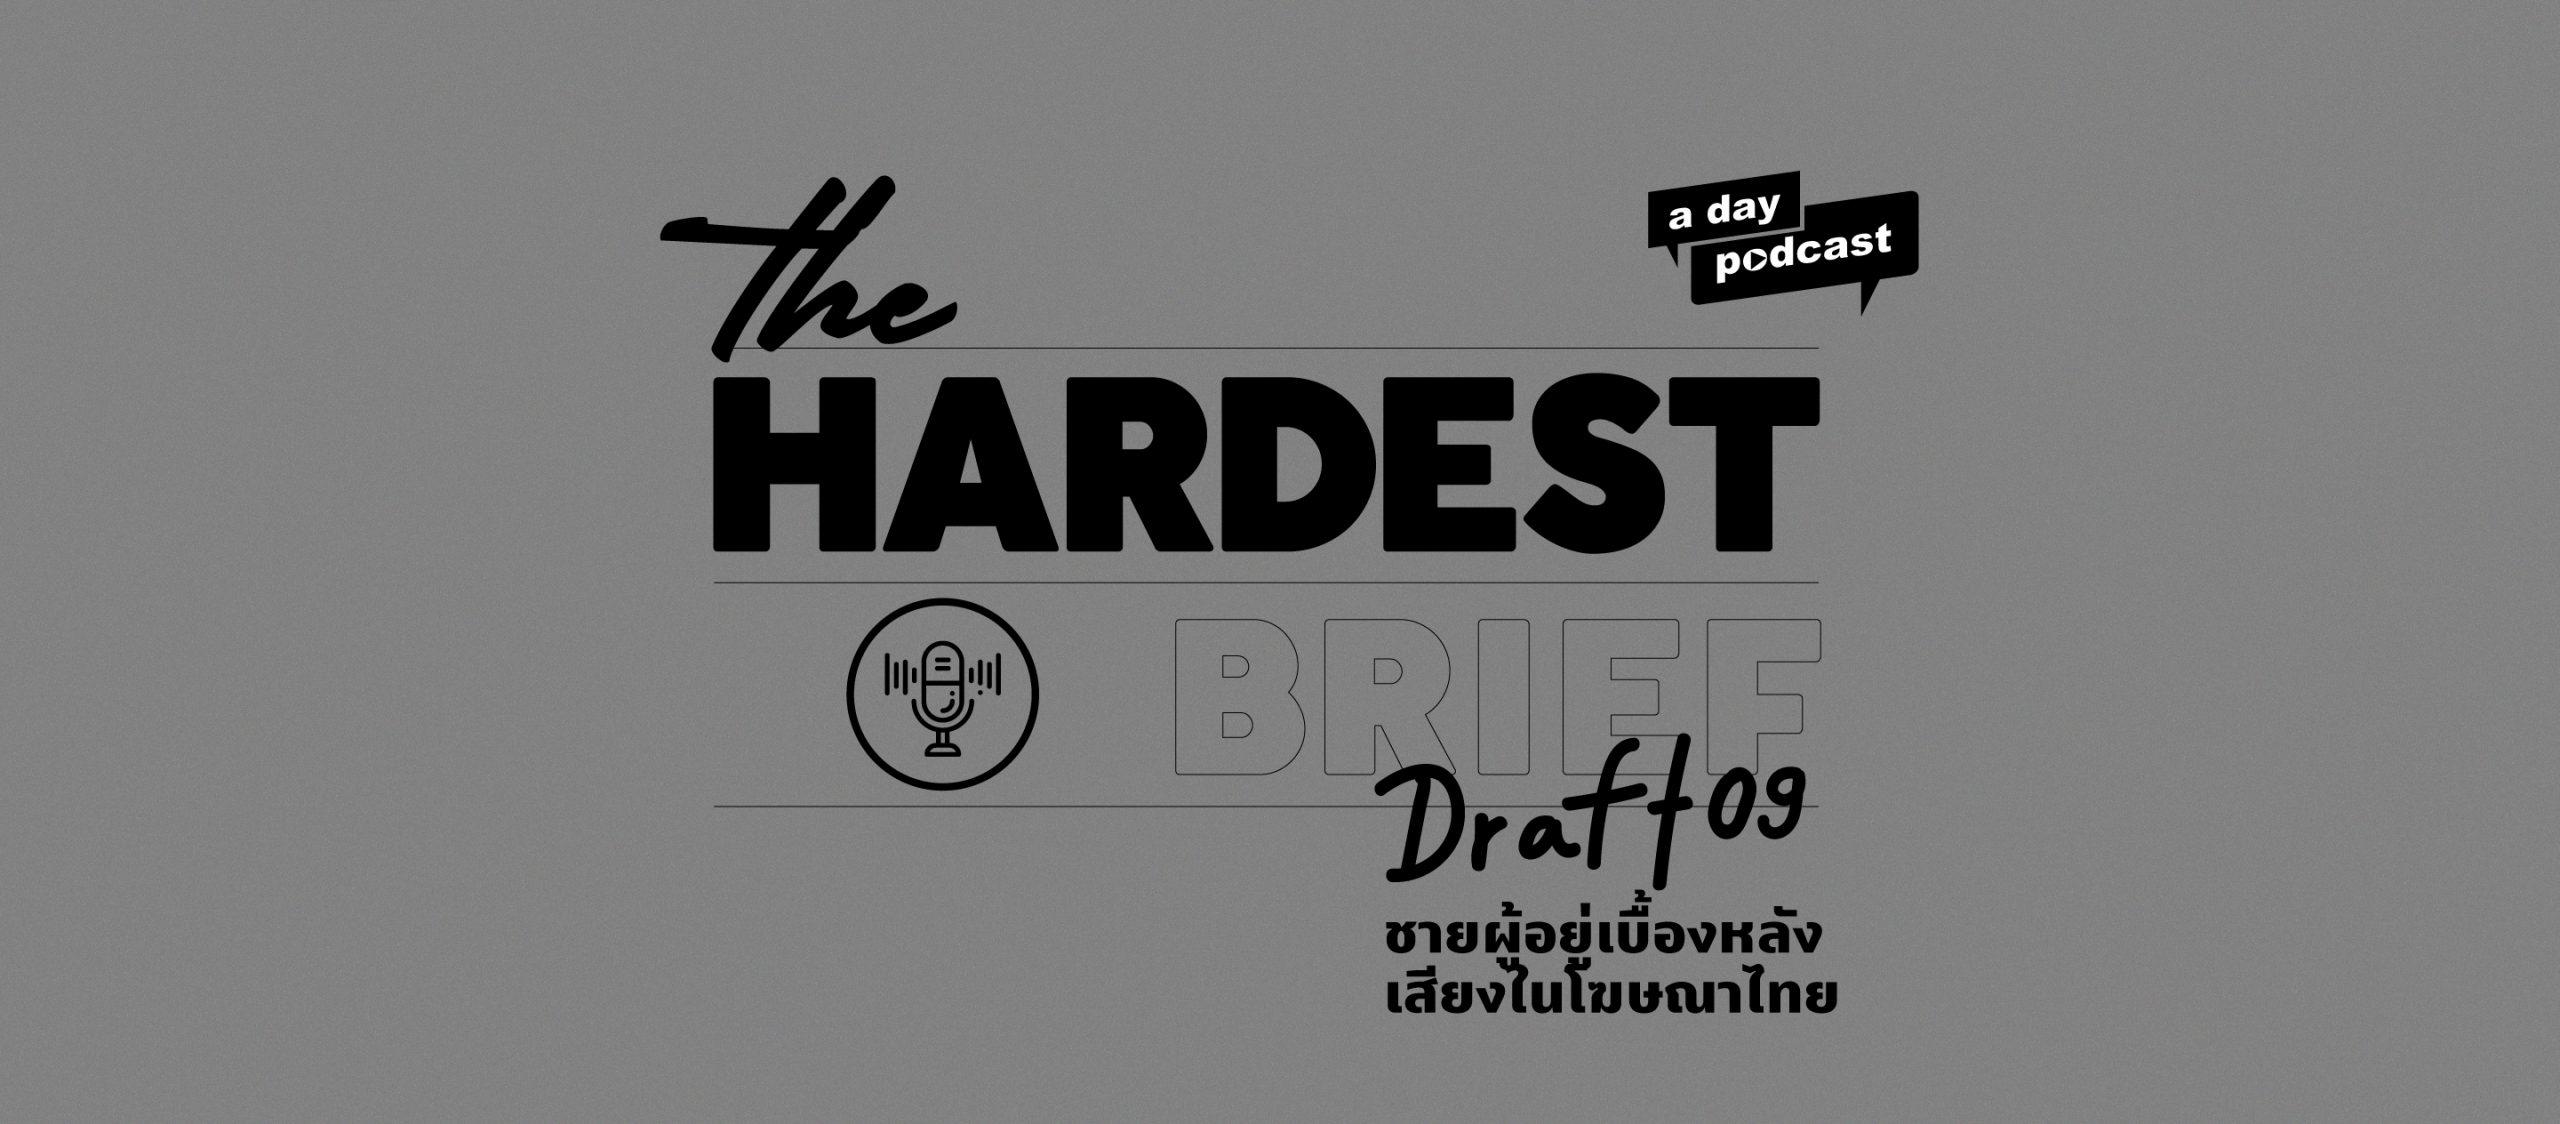 The Hardest Brief EP.09 คุยกับนักขายเสียงให้โฆษณาไทย ดาร์ท–ธนทร ศิริรักษ์